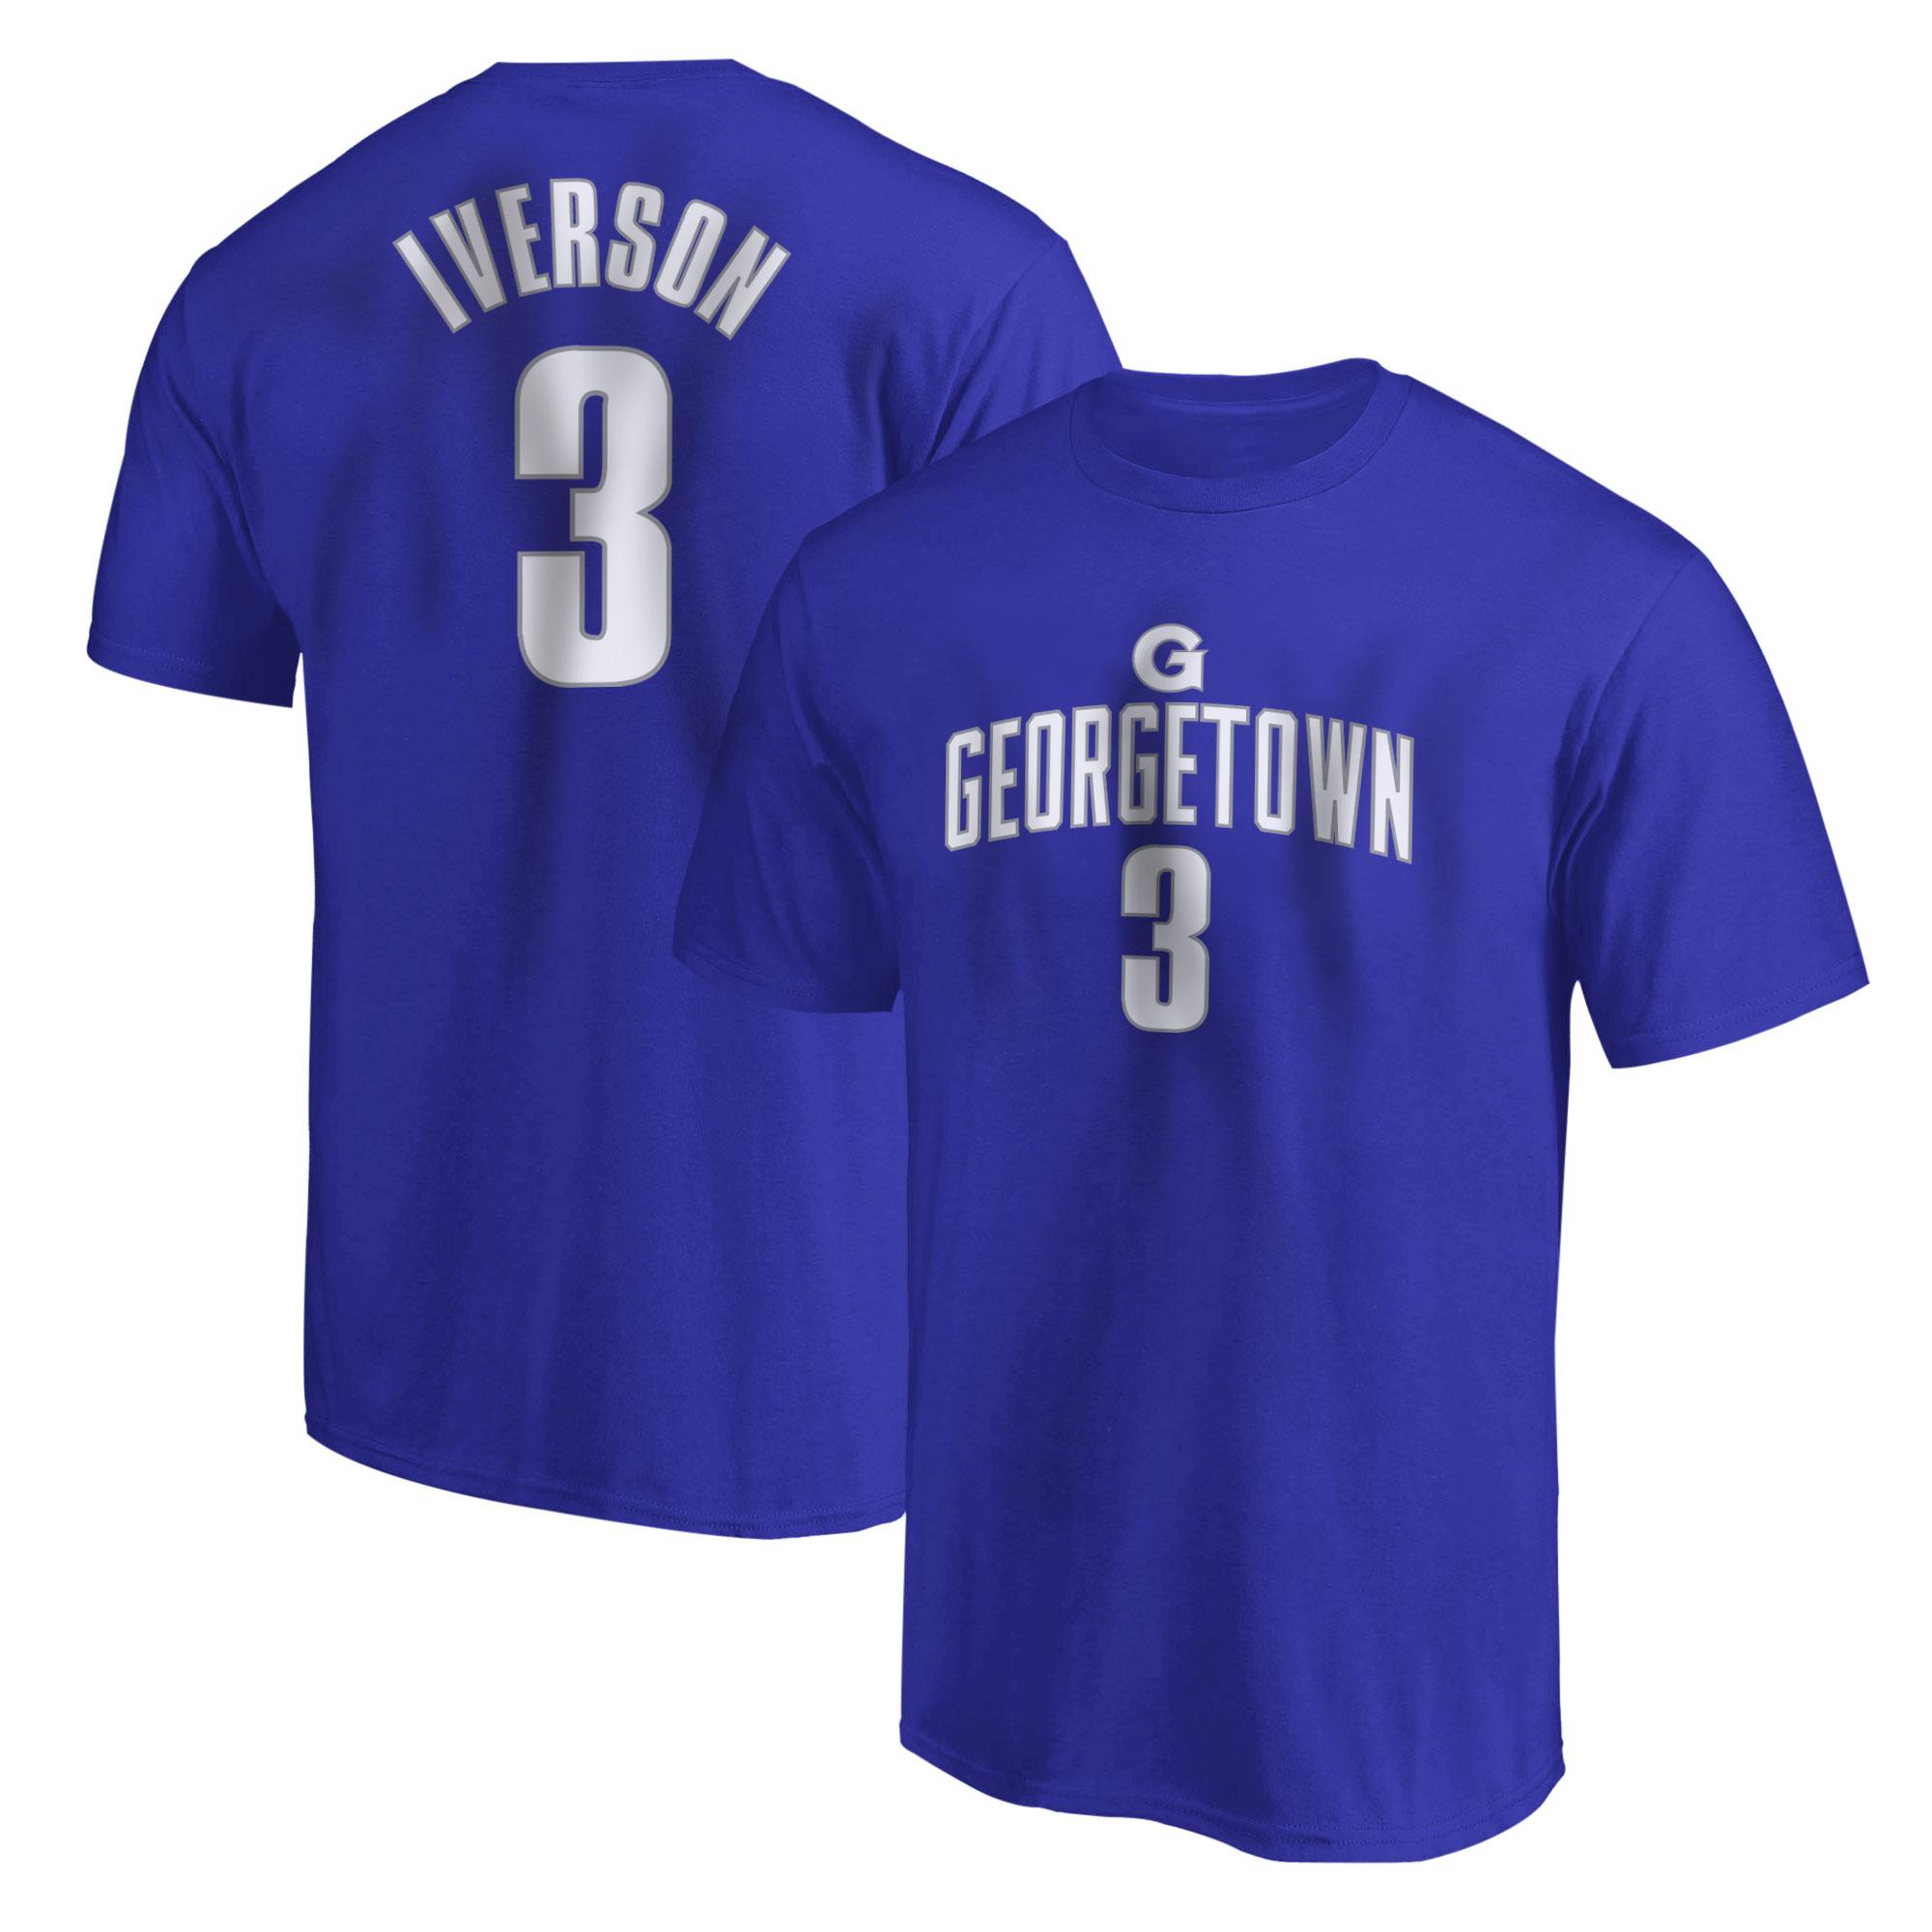 Allen Iverson Tshirt (TSH-BLU-480-PLYR-IVERSON)